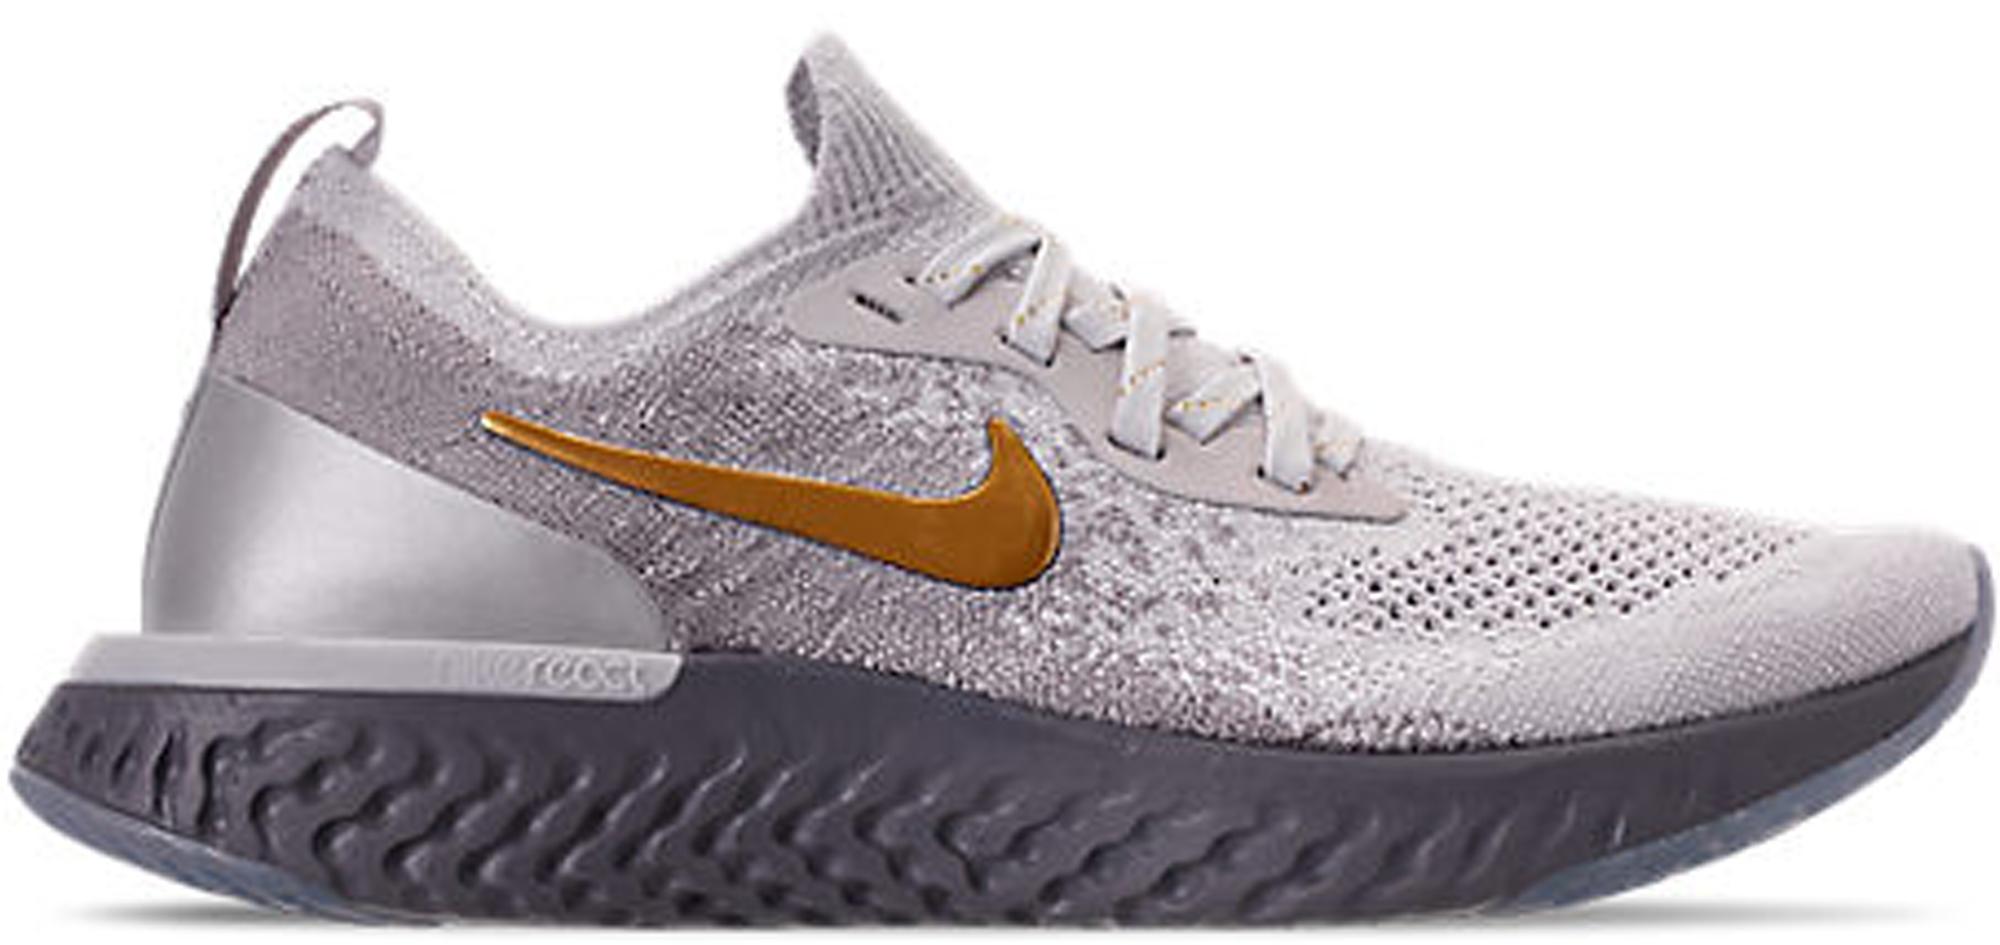 Nike Epic React Flyknit Vast Grey